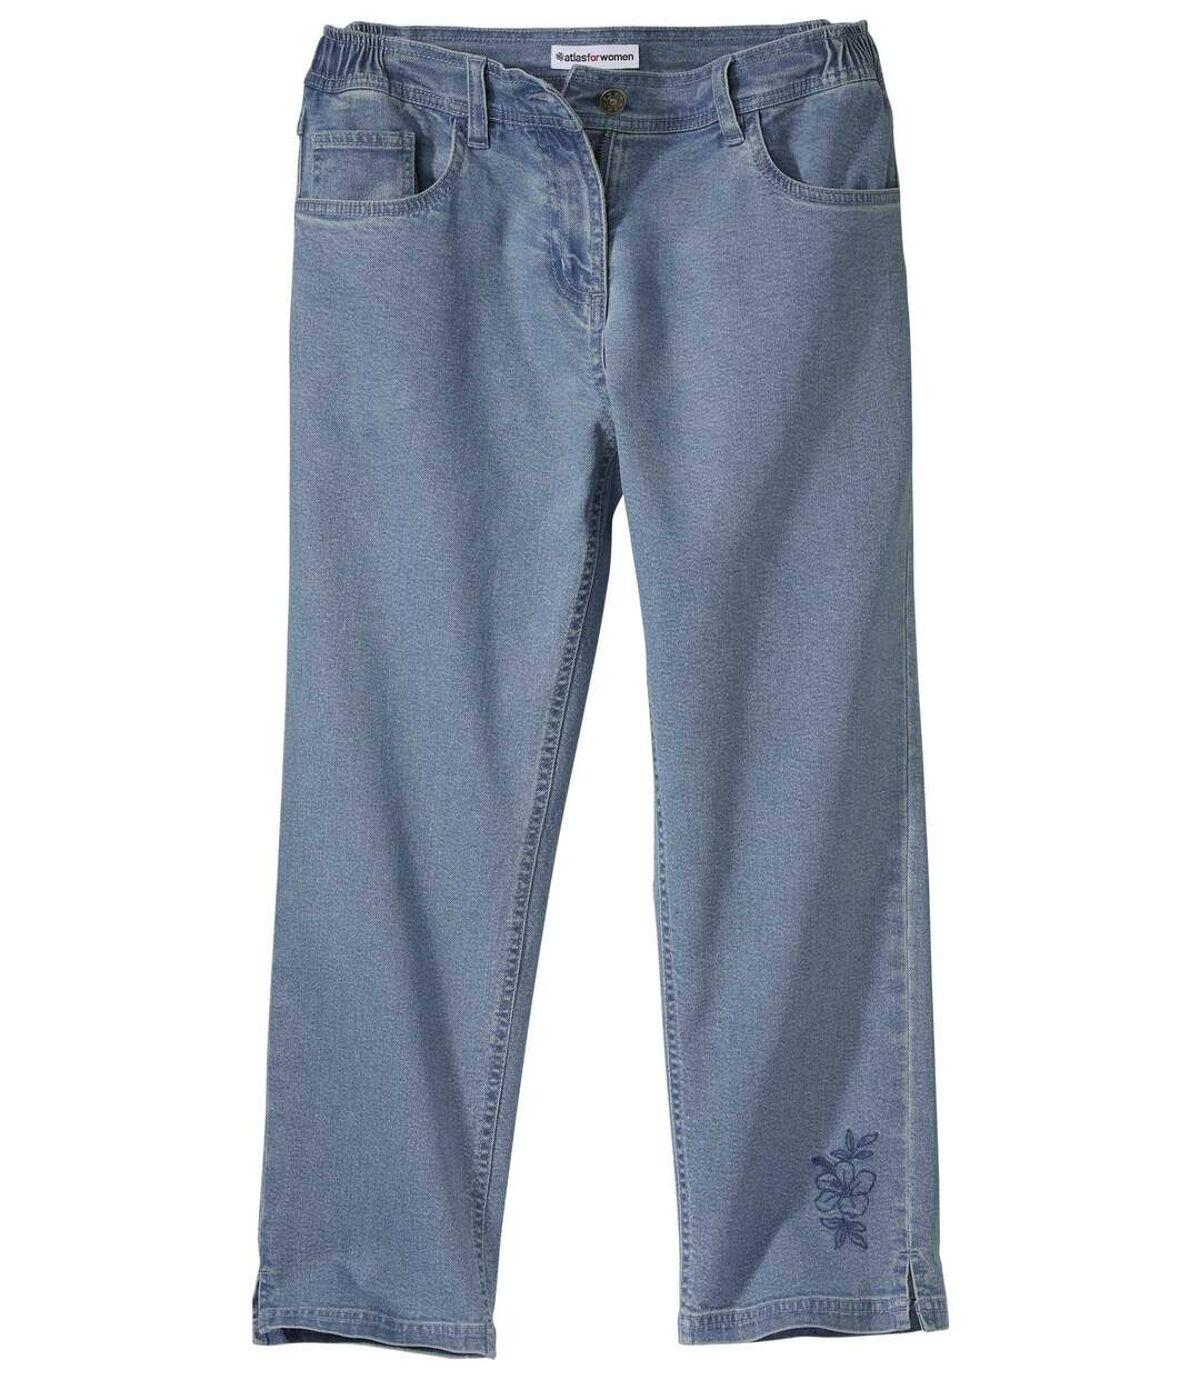 Haftowane jeansy 7/8 ze stretchu Atlas For Men